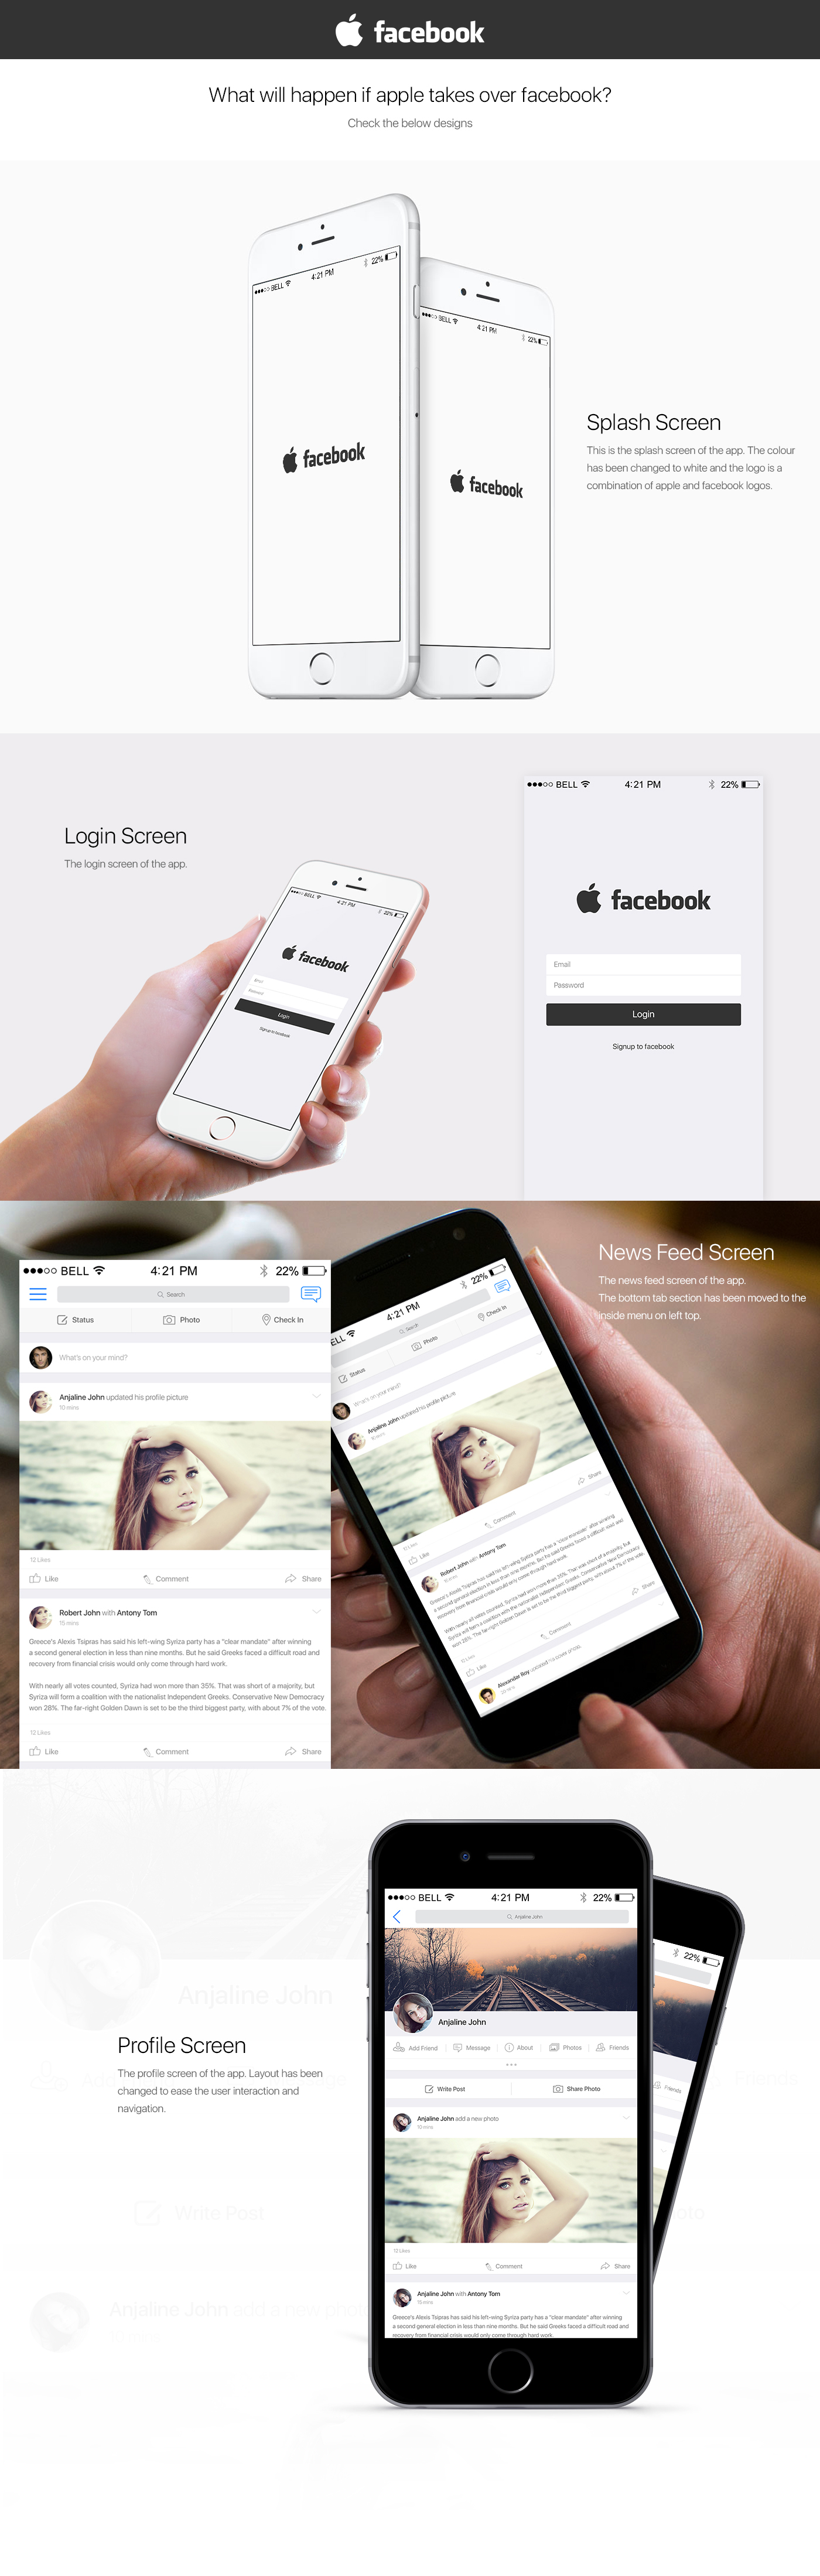 apple facebook Apple + Facebook design concept Redesigning concept